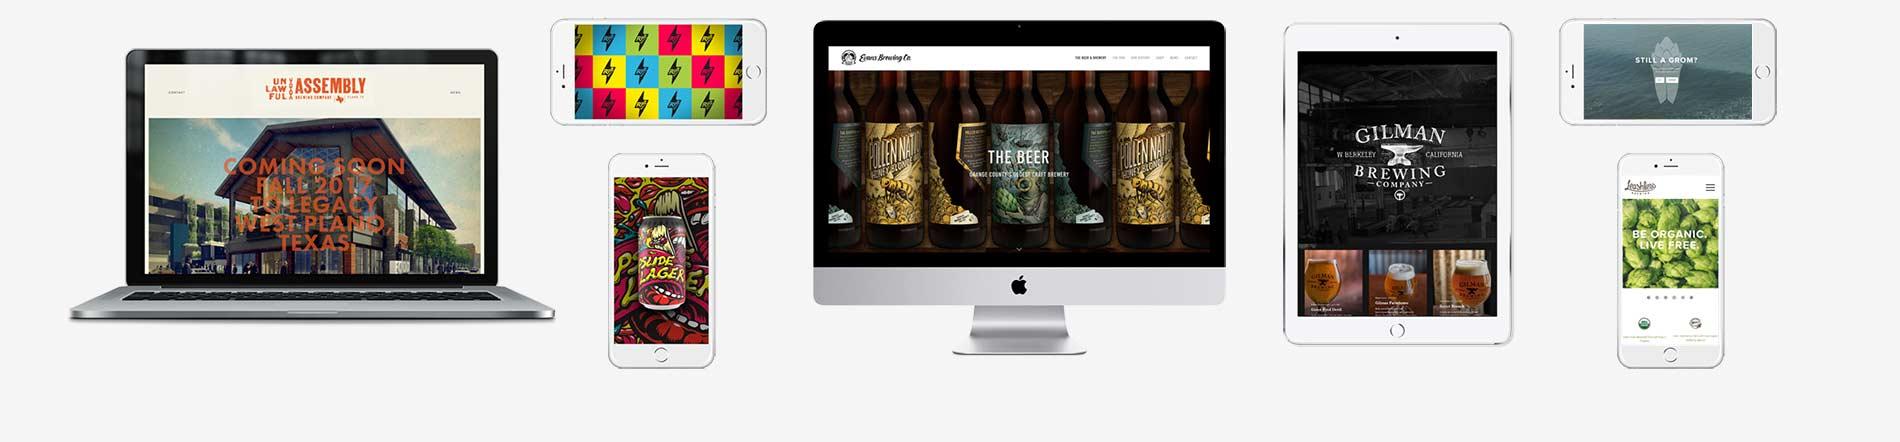 Brewery Website Design. ©Danno The Manno, Inc.